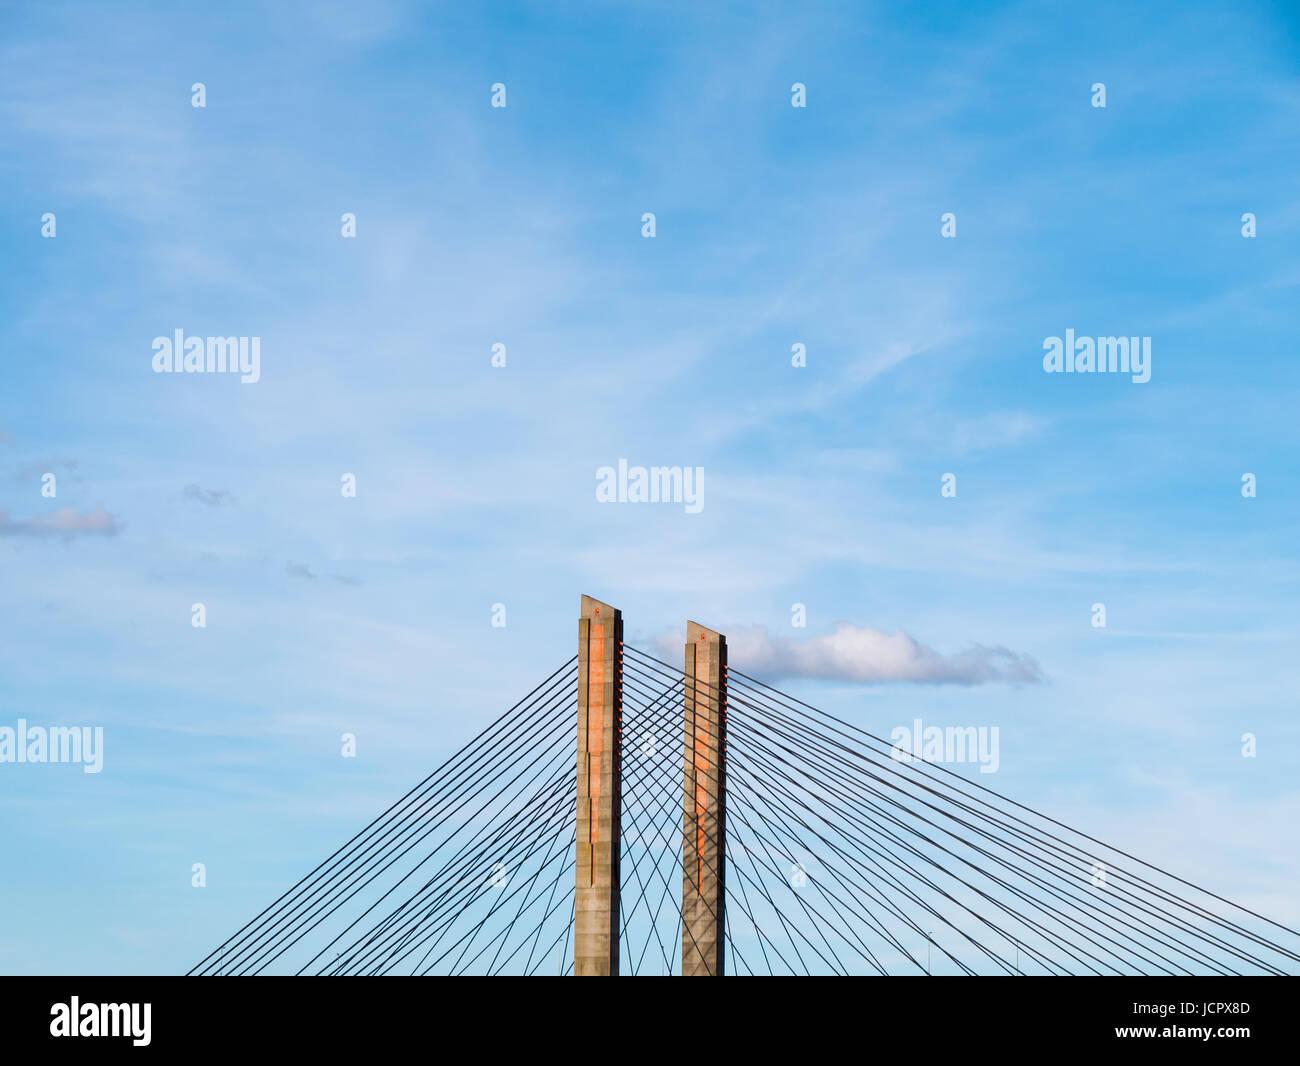 Detail of pillars and cables of Martinus Nijhoff Bridge and river Waal near Zaltbommel, Gelderland, Netherlands - Stock Image